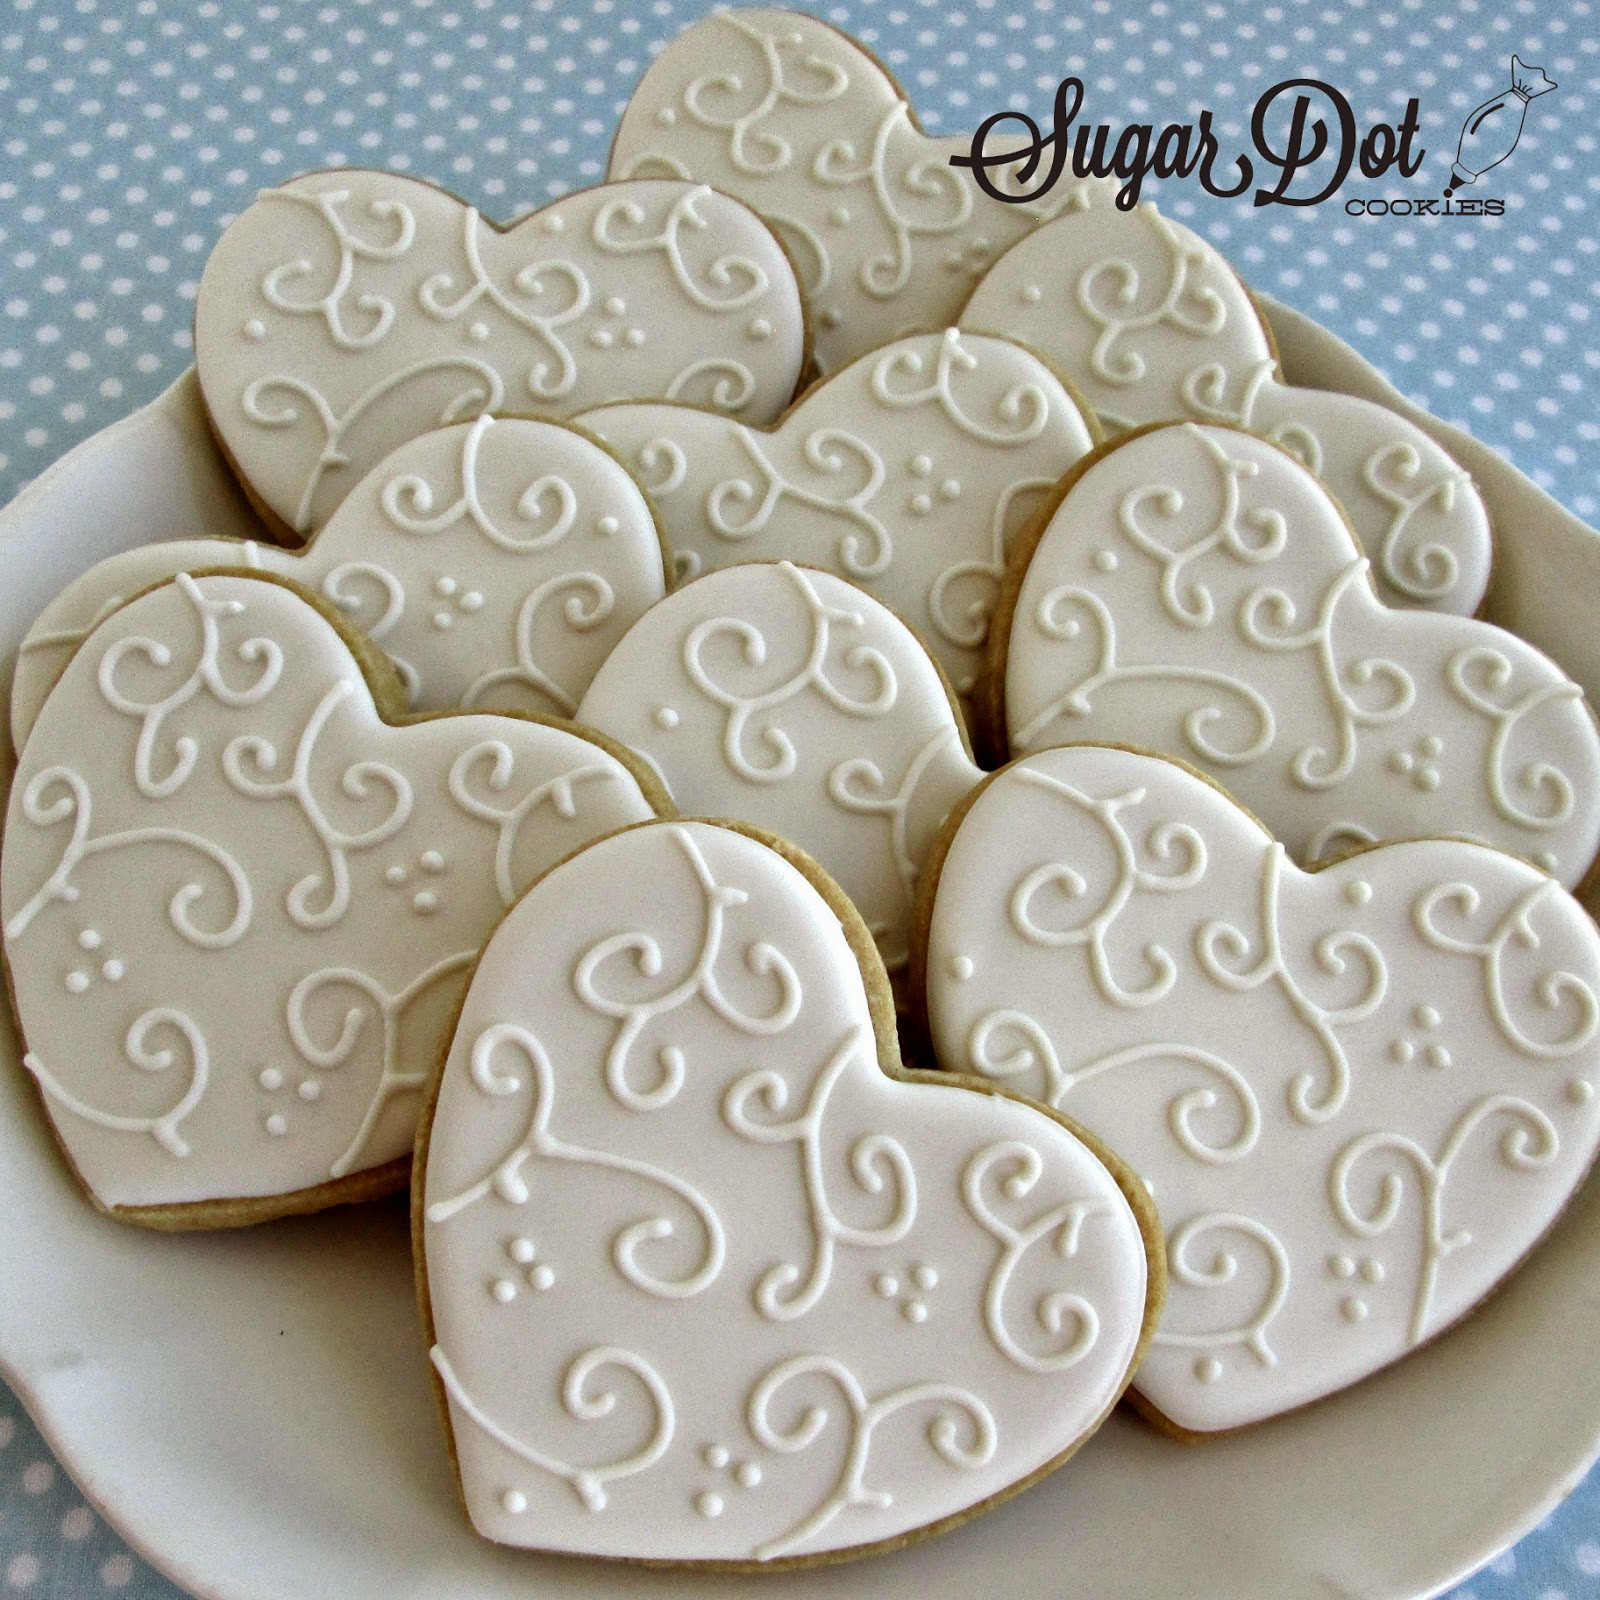 Wedding Sugar Cookies Decorating Ideas  Elegant white on white So pretty for a wedding